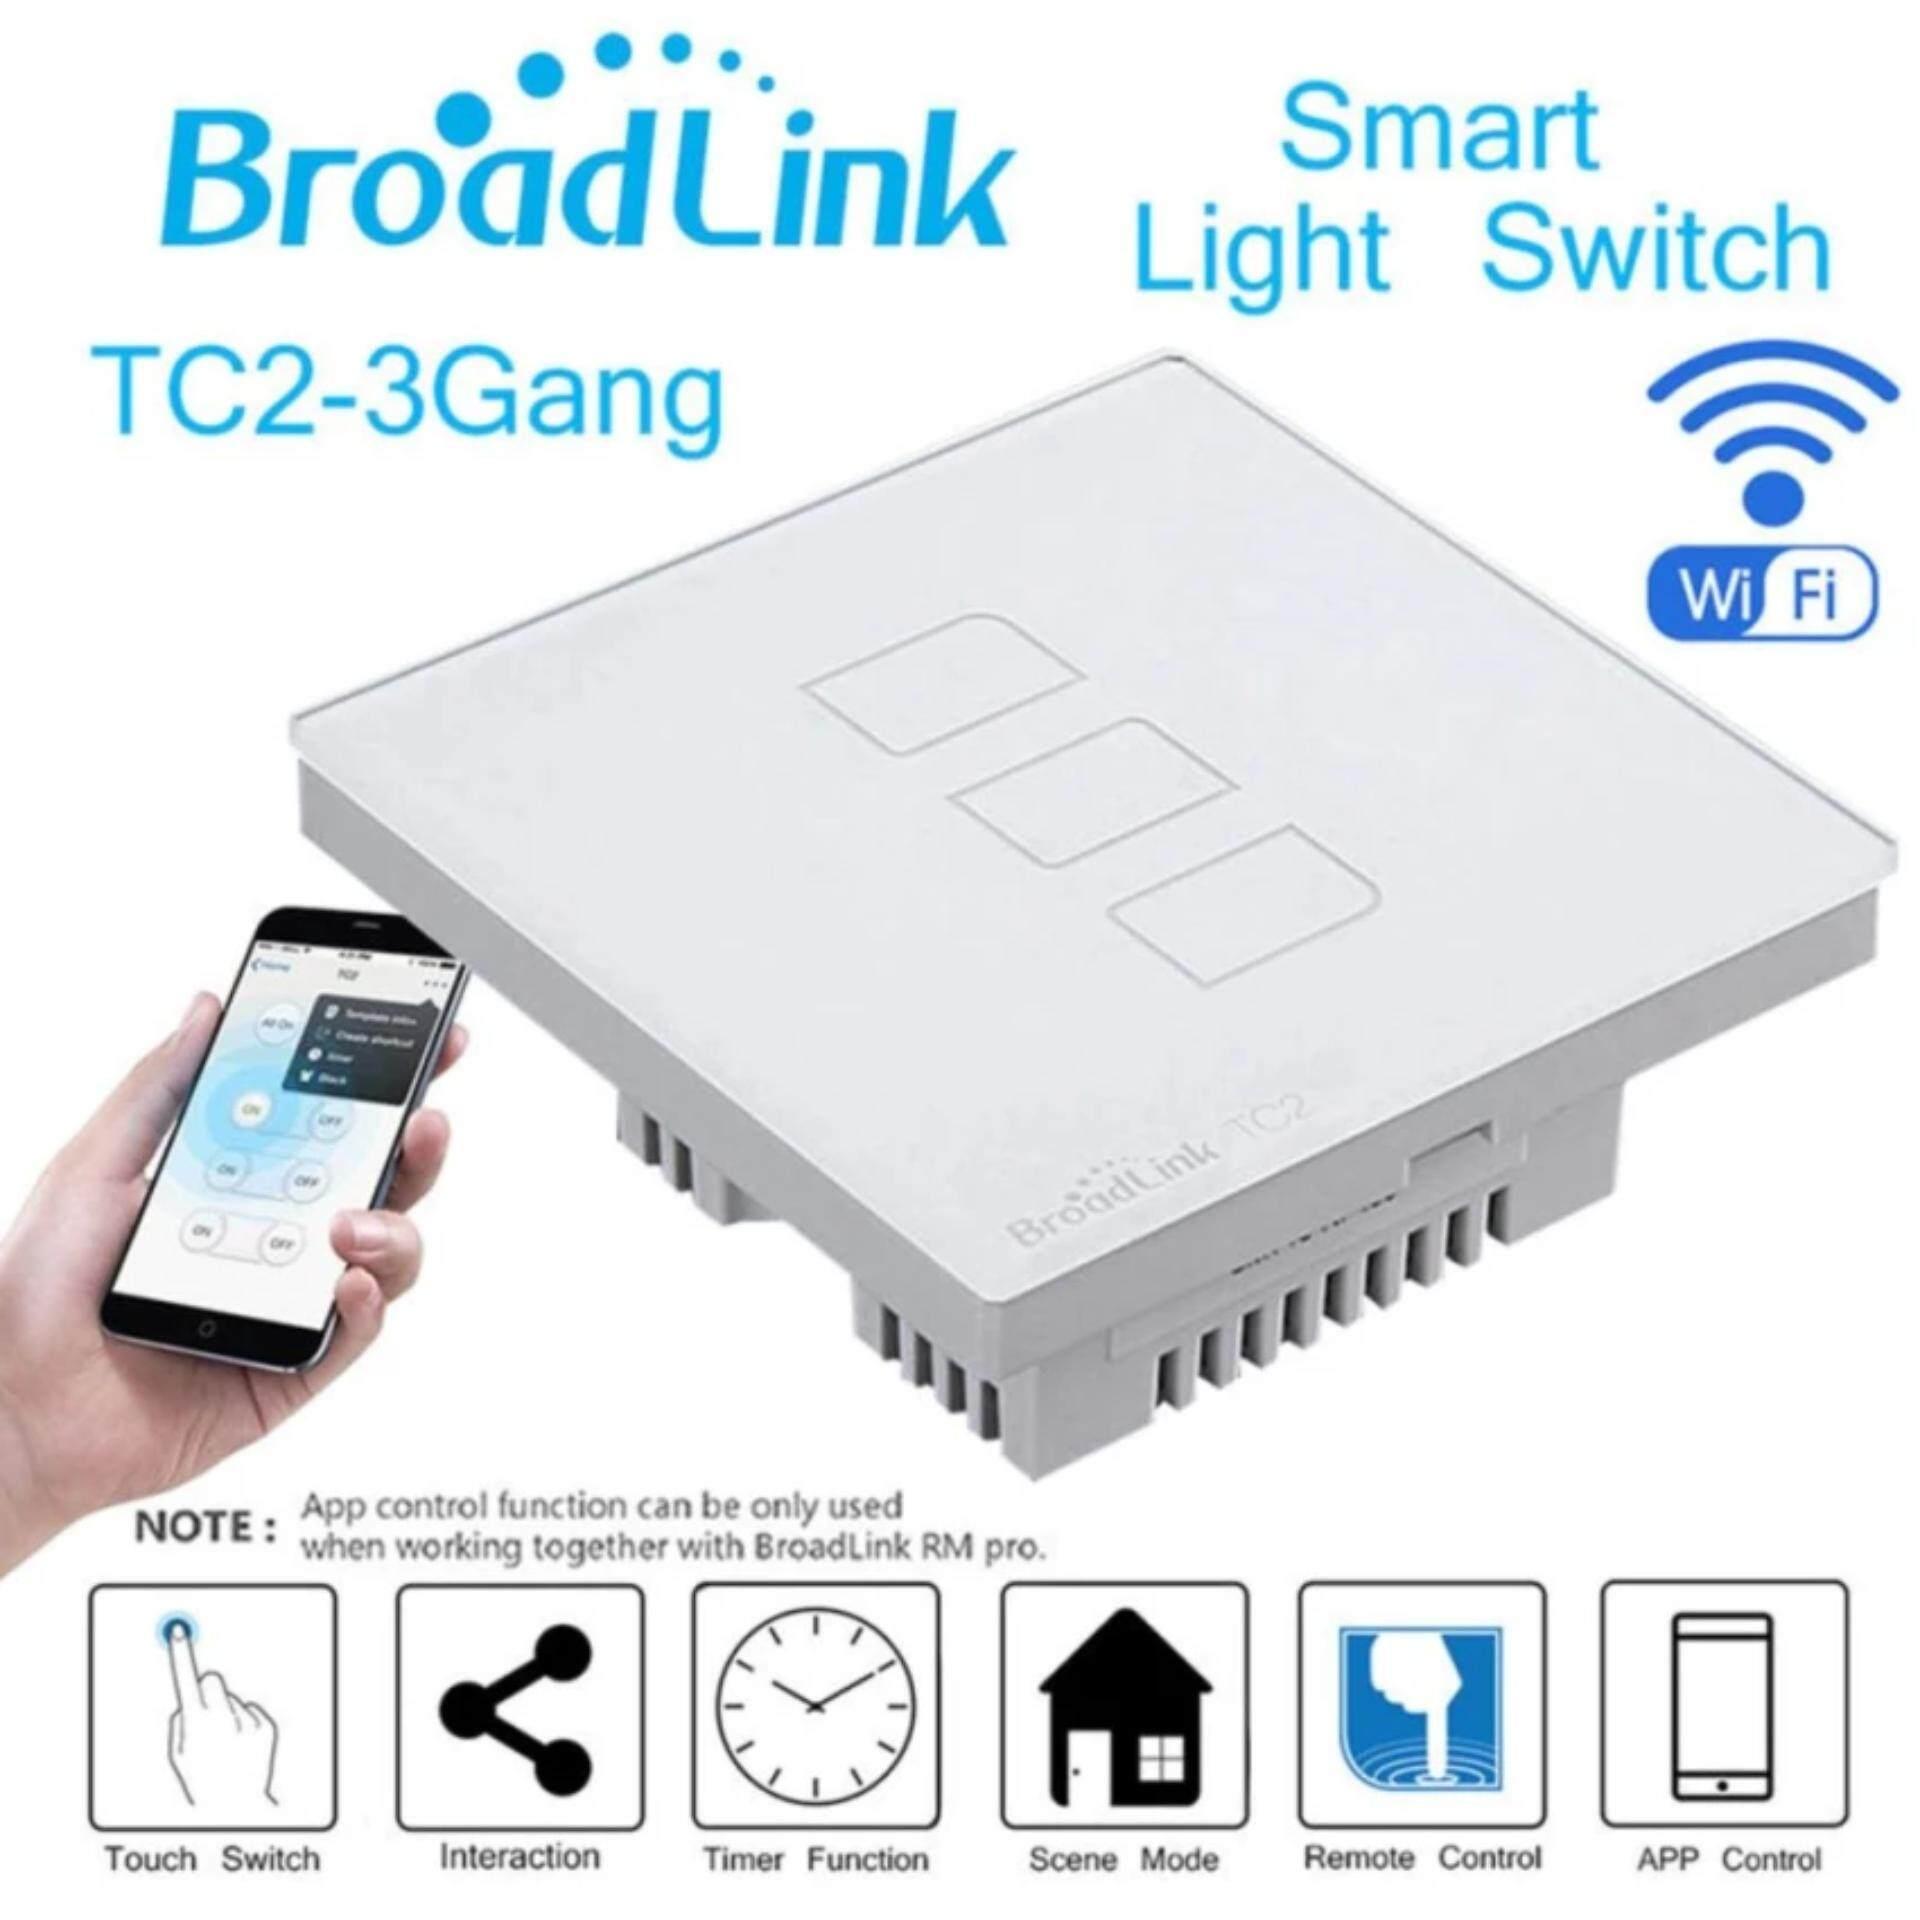 Original Broadlink Tc2 3 Gang Smart Home Automation Mobile Wireless Light Switch Uk Buy Remote Control